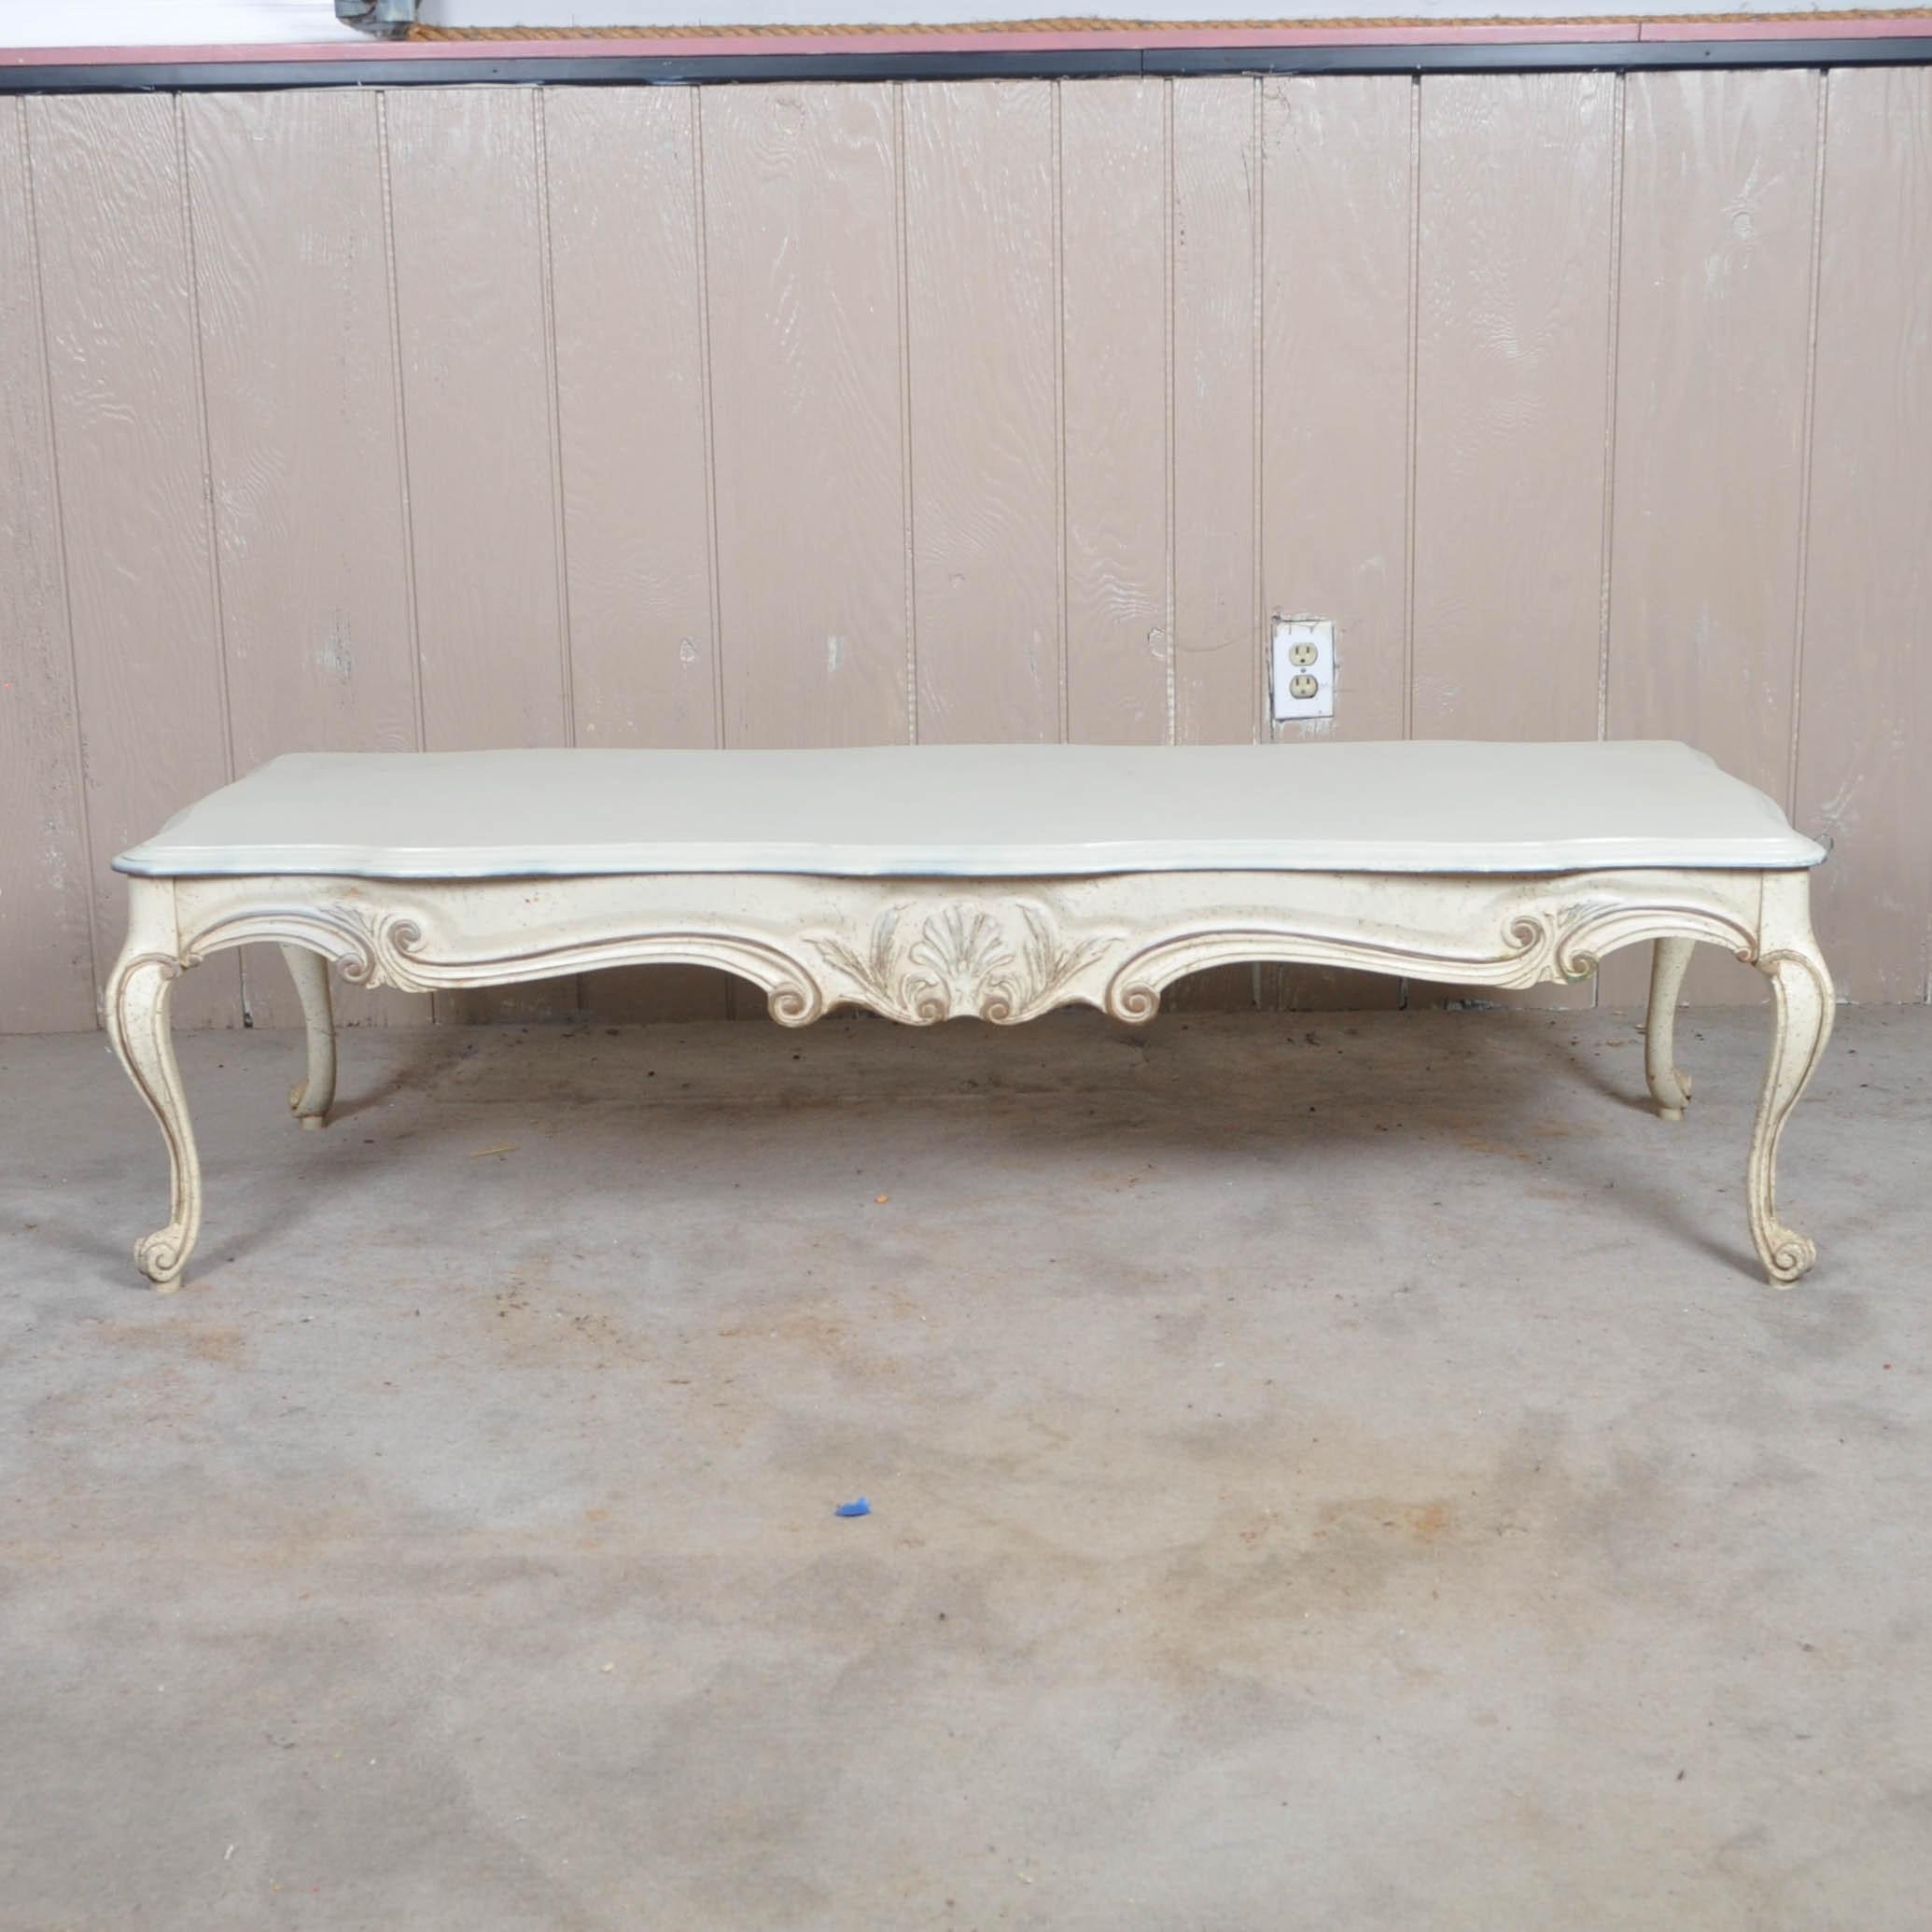 Gordon S Inc White Queen Anne Style Coffee Table Ebth